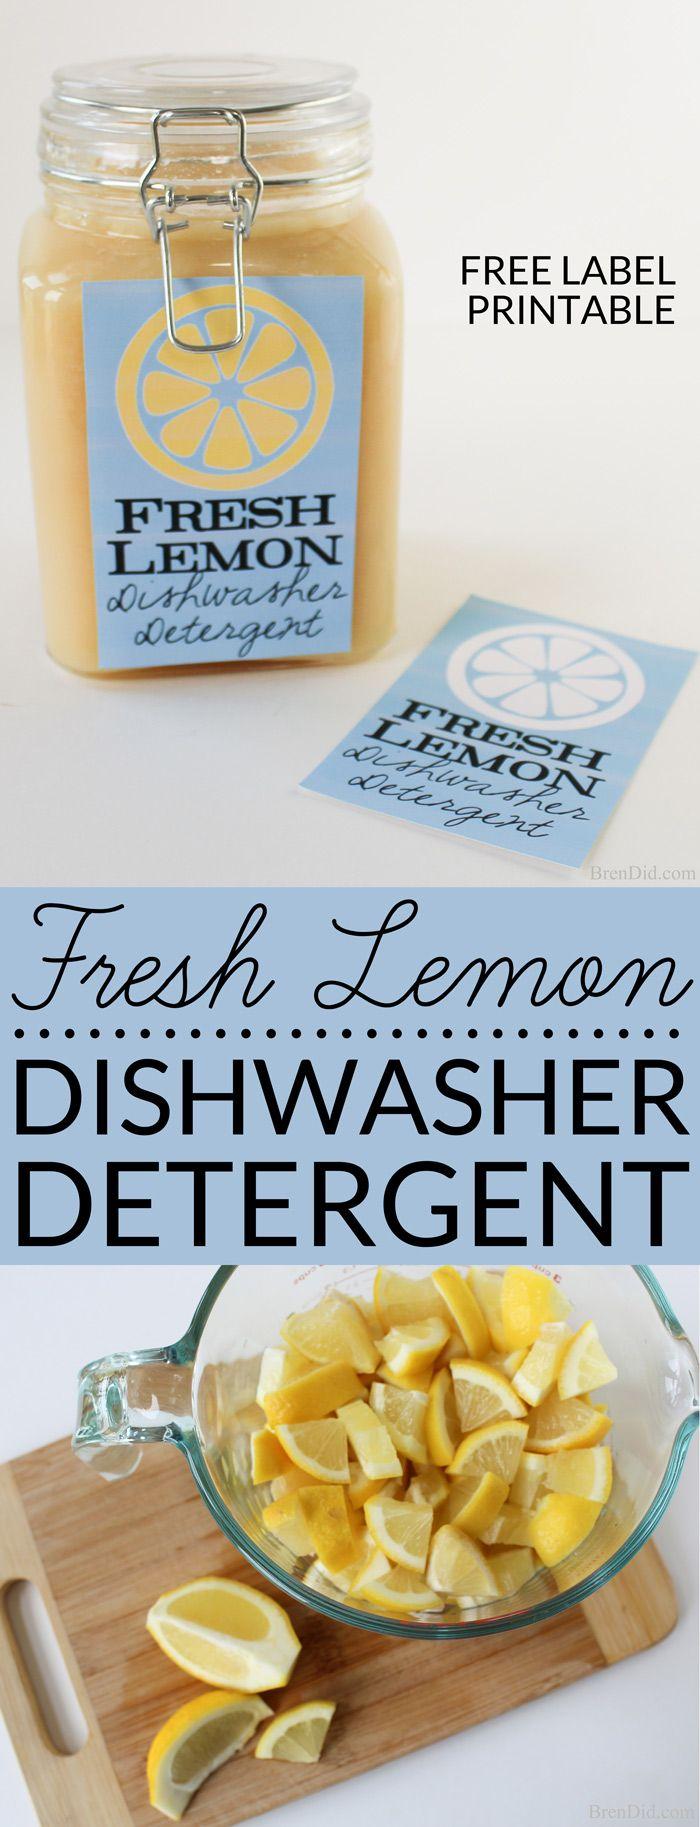 homemade dishwasher cleaner. love natural diy products? fresh lemon homemade dishwasher detergent uses real lemons, salt \u0026 vinegar to make liquid that cleans cleaner t